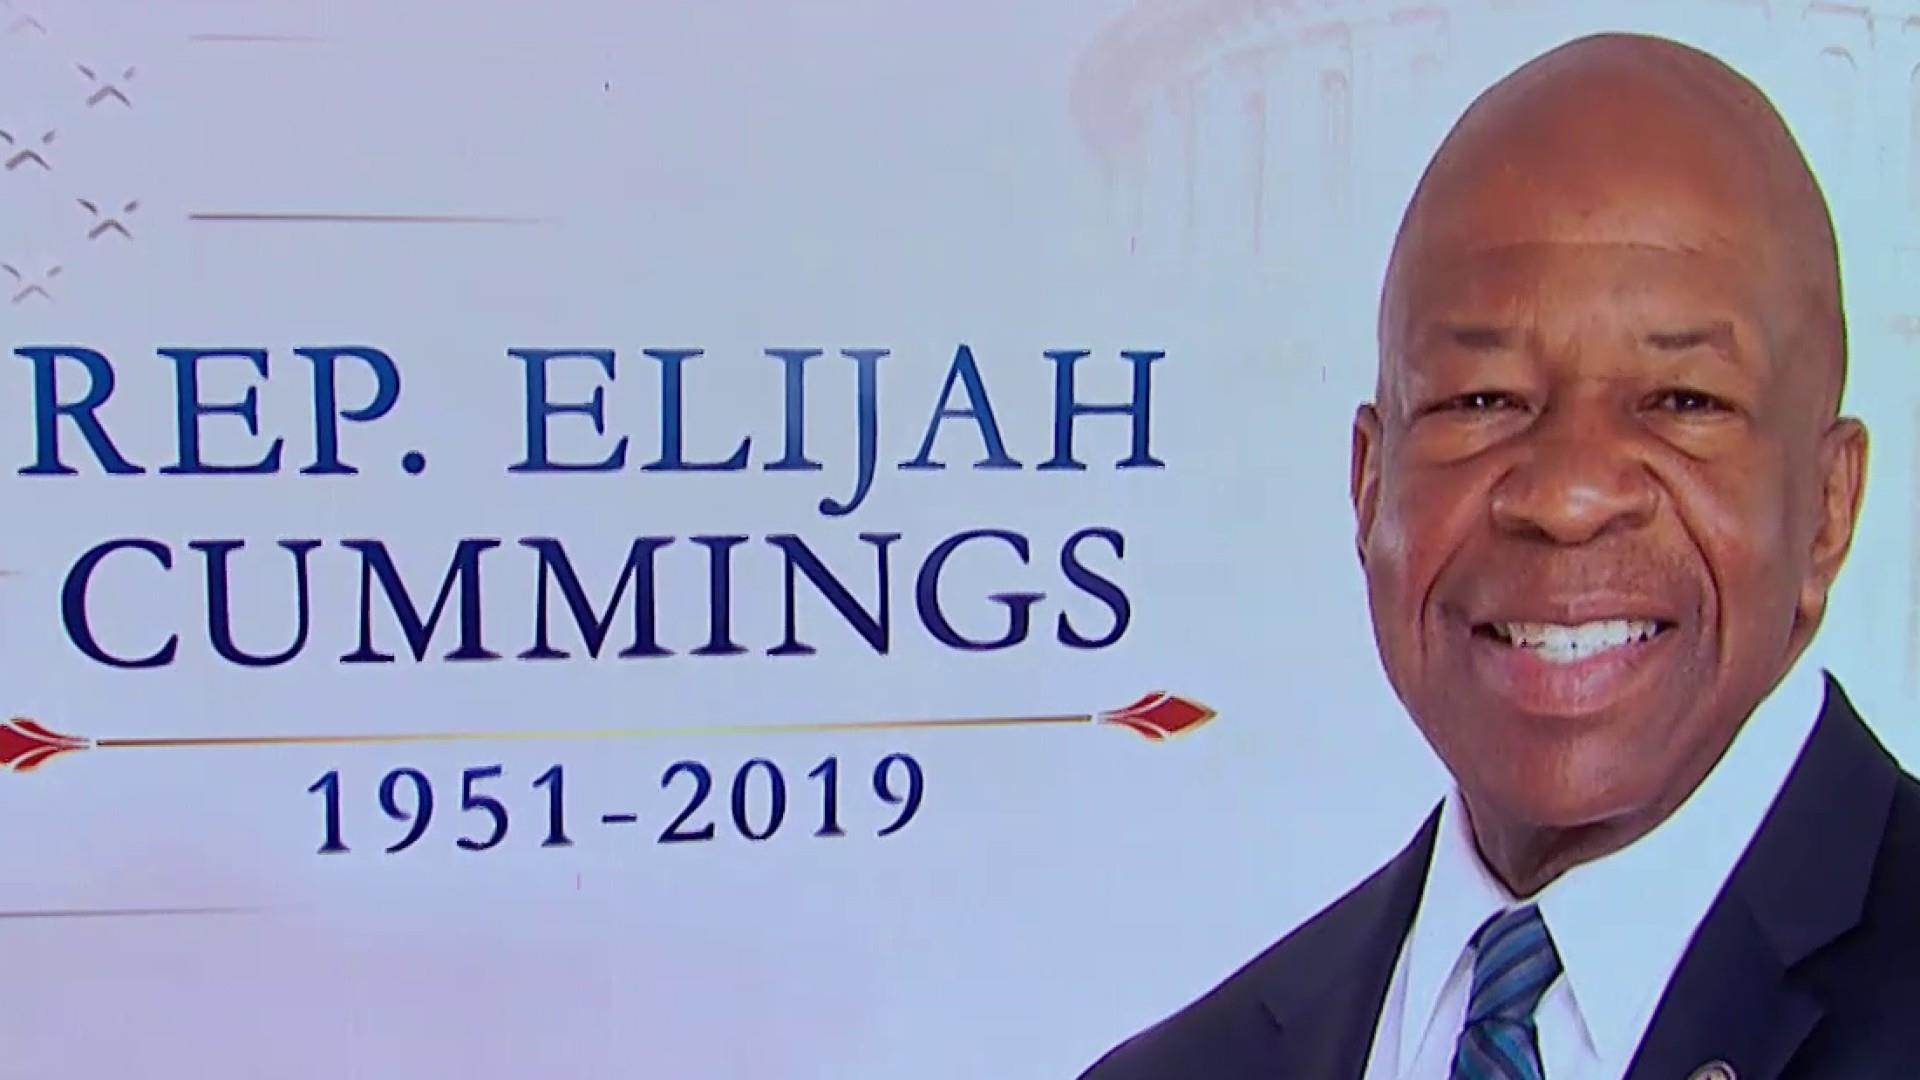 Elijah Cummings remembered for leadership, time in Congress